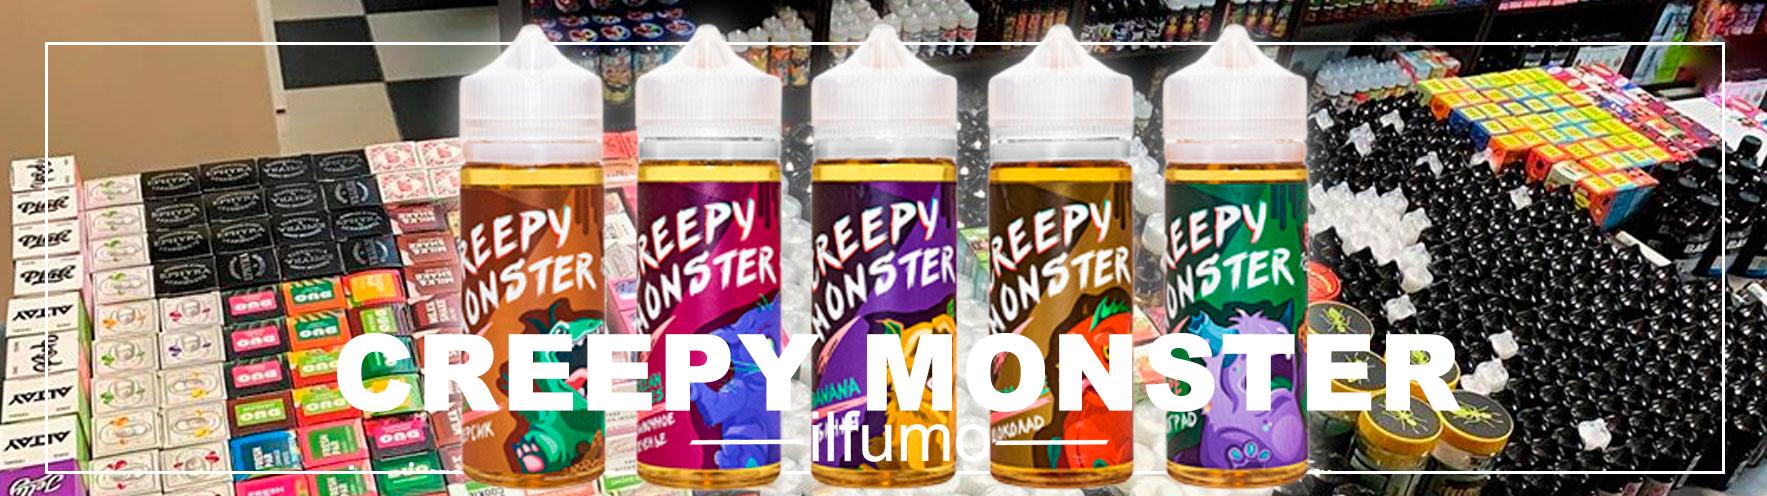 creepy monster vape liquid - Жидкость Creepy Monster